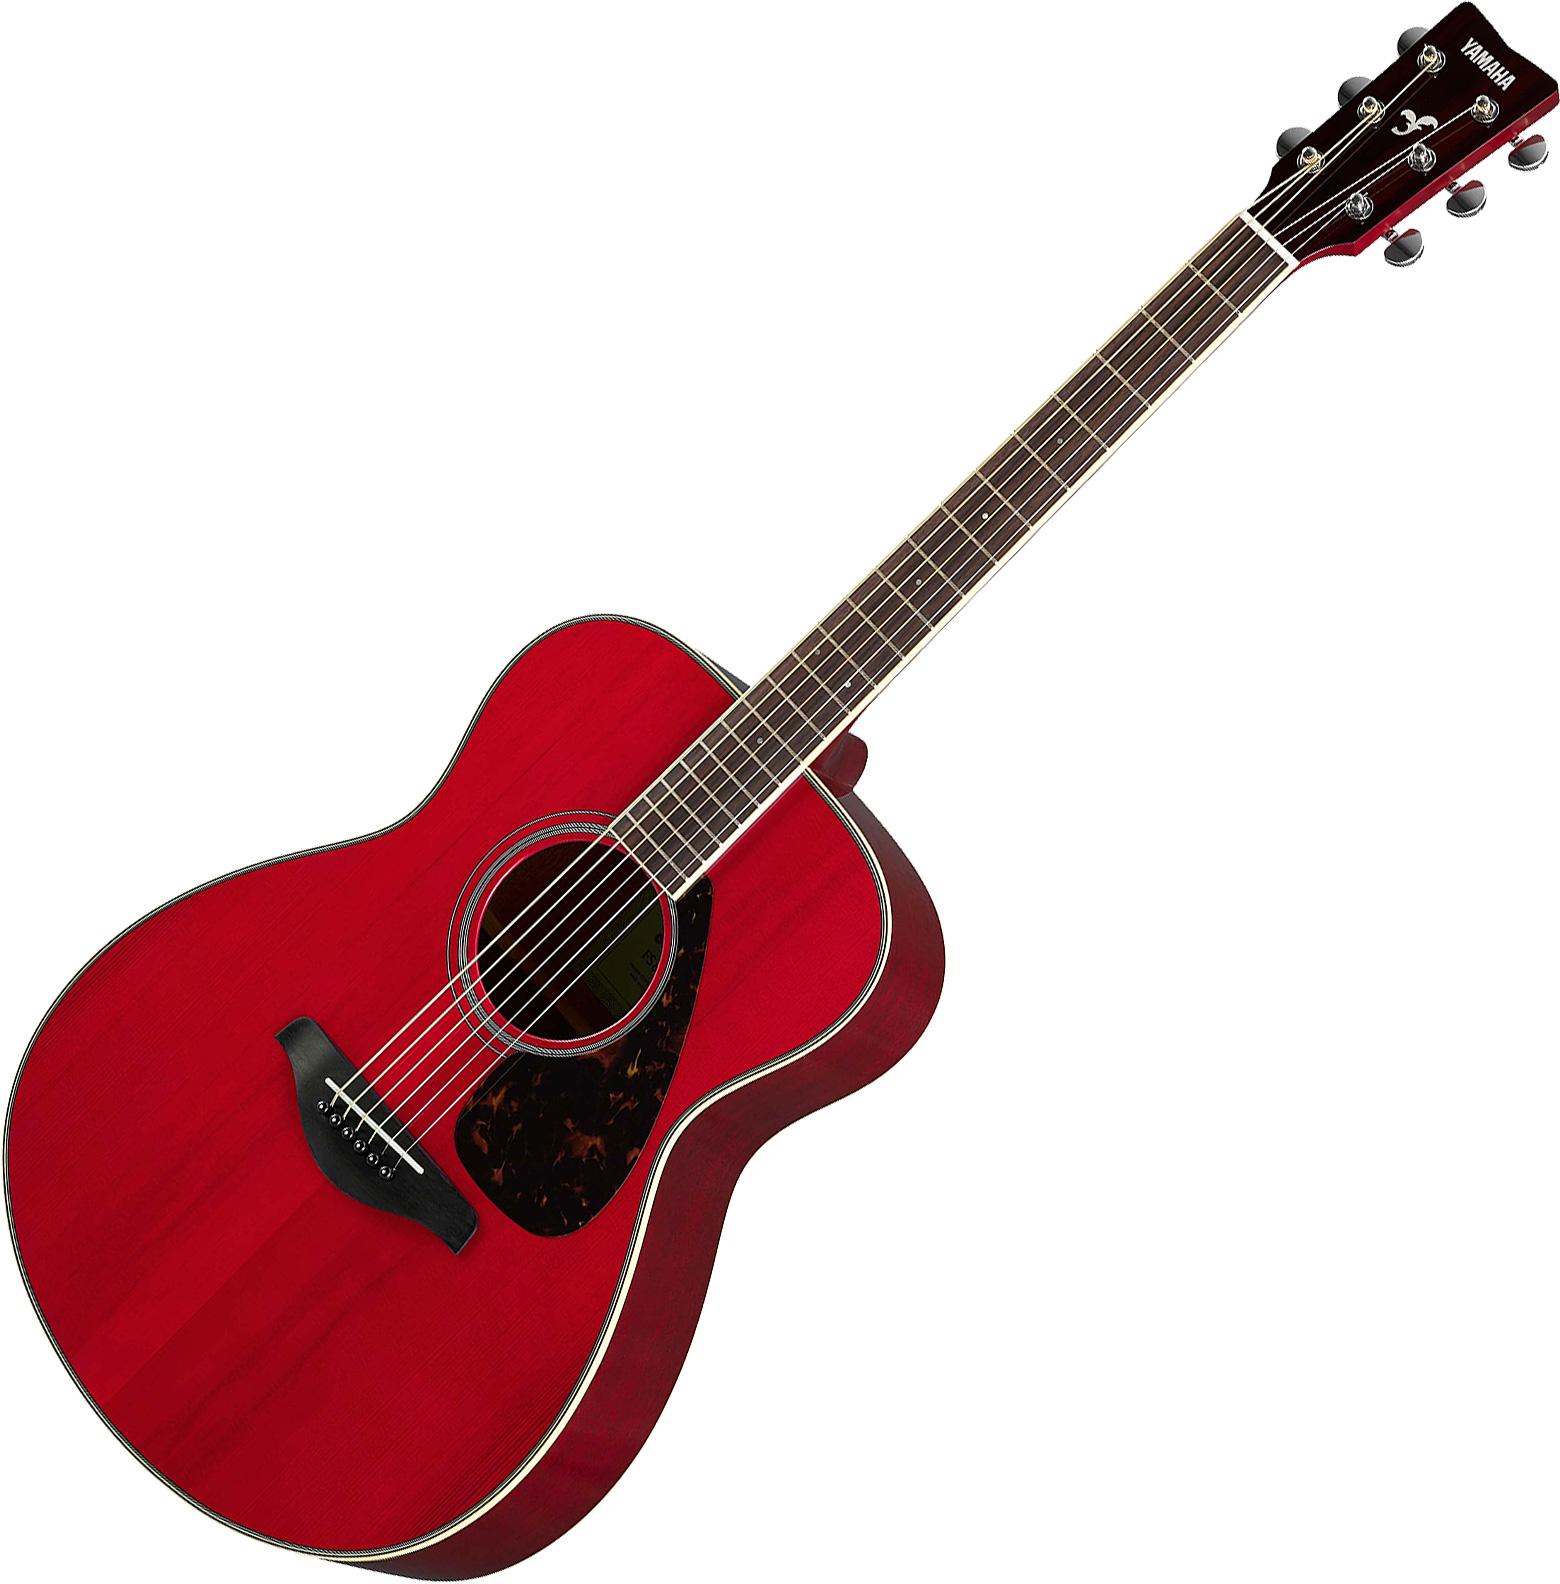 Guitare folk & electro Yamaha FS820 RR - ruby red gloss